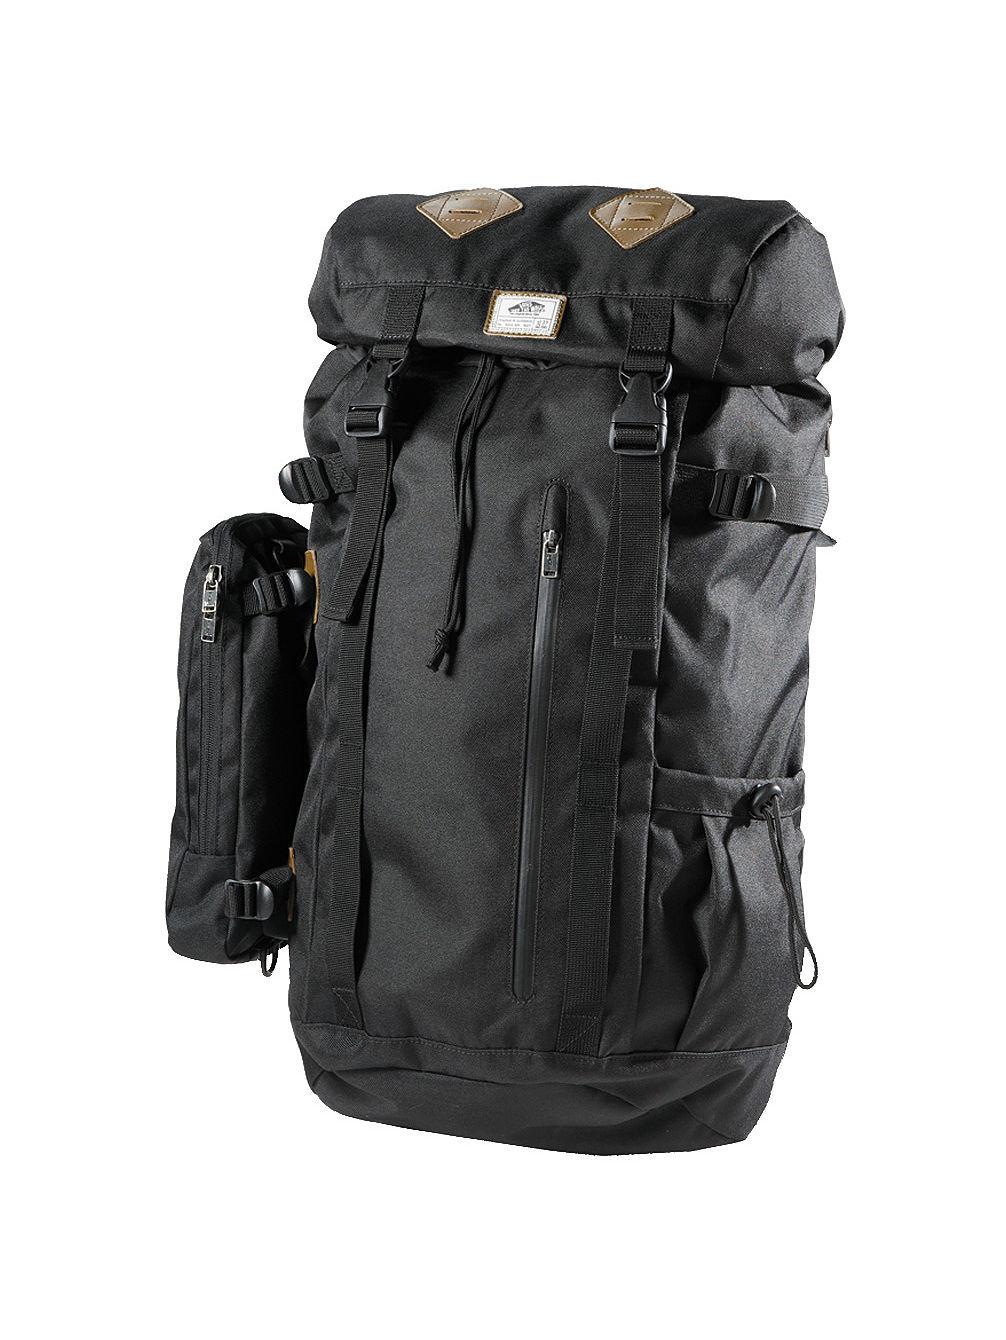 80dbf86eb5 Buy Vans Depot Backpack online at Blue Tomato